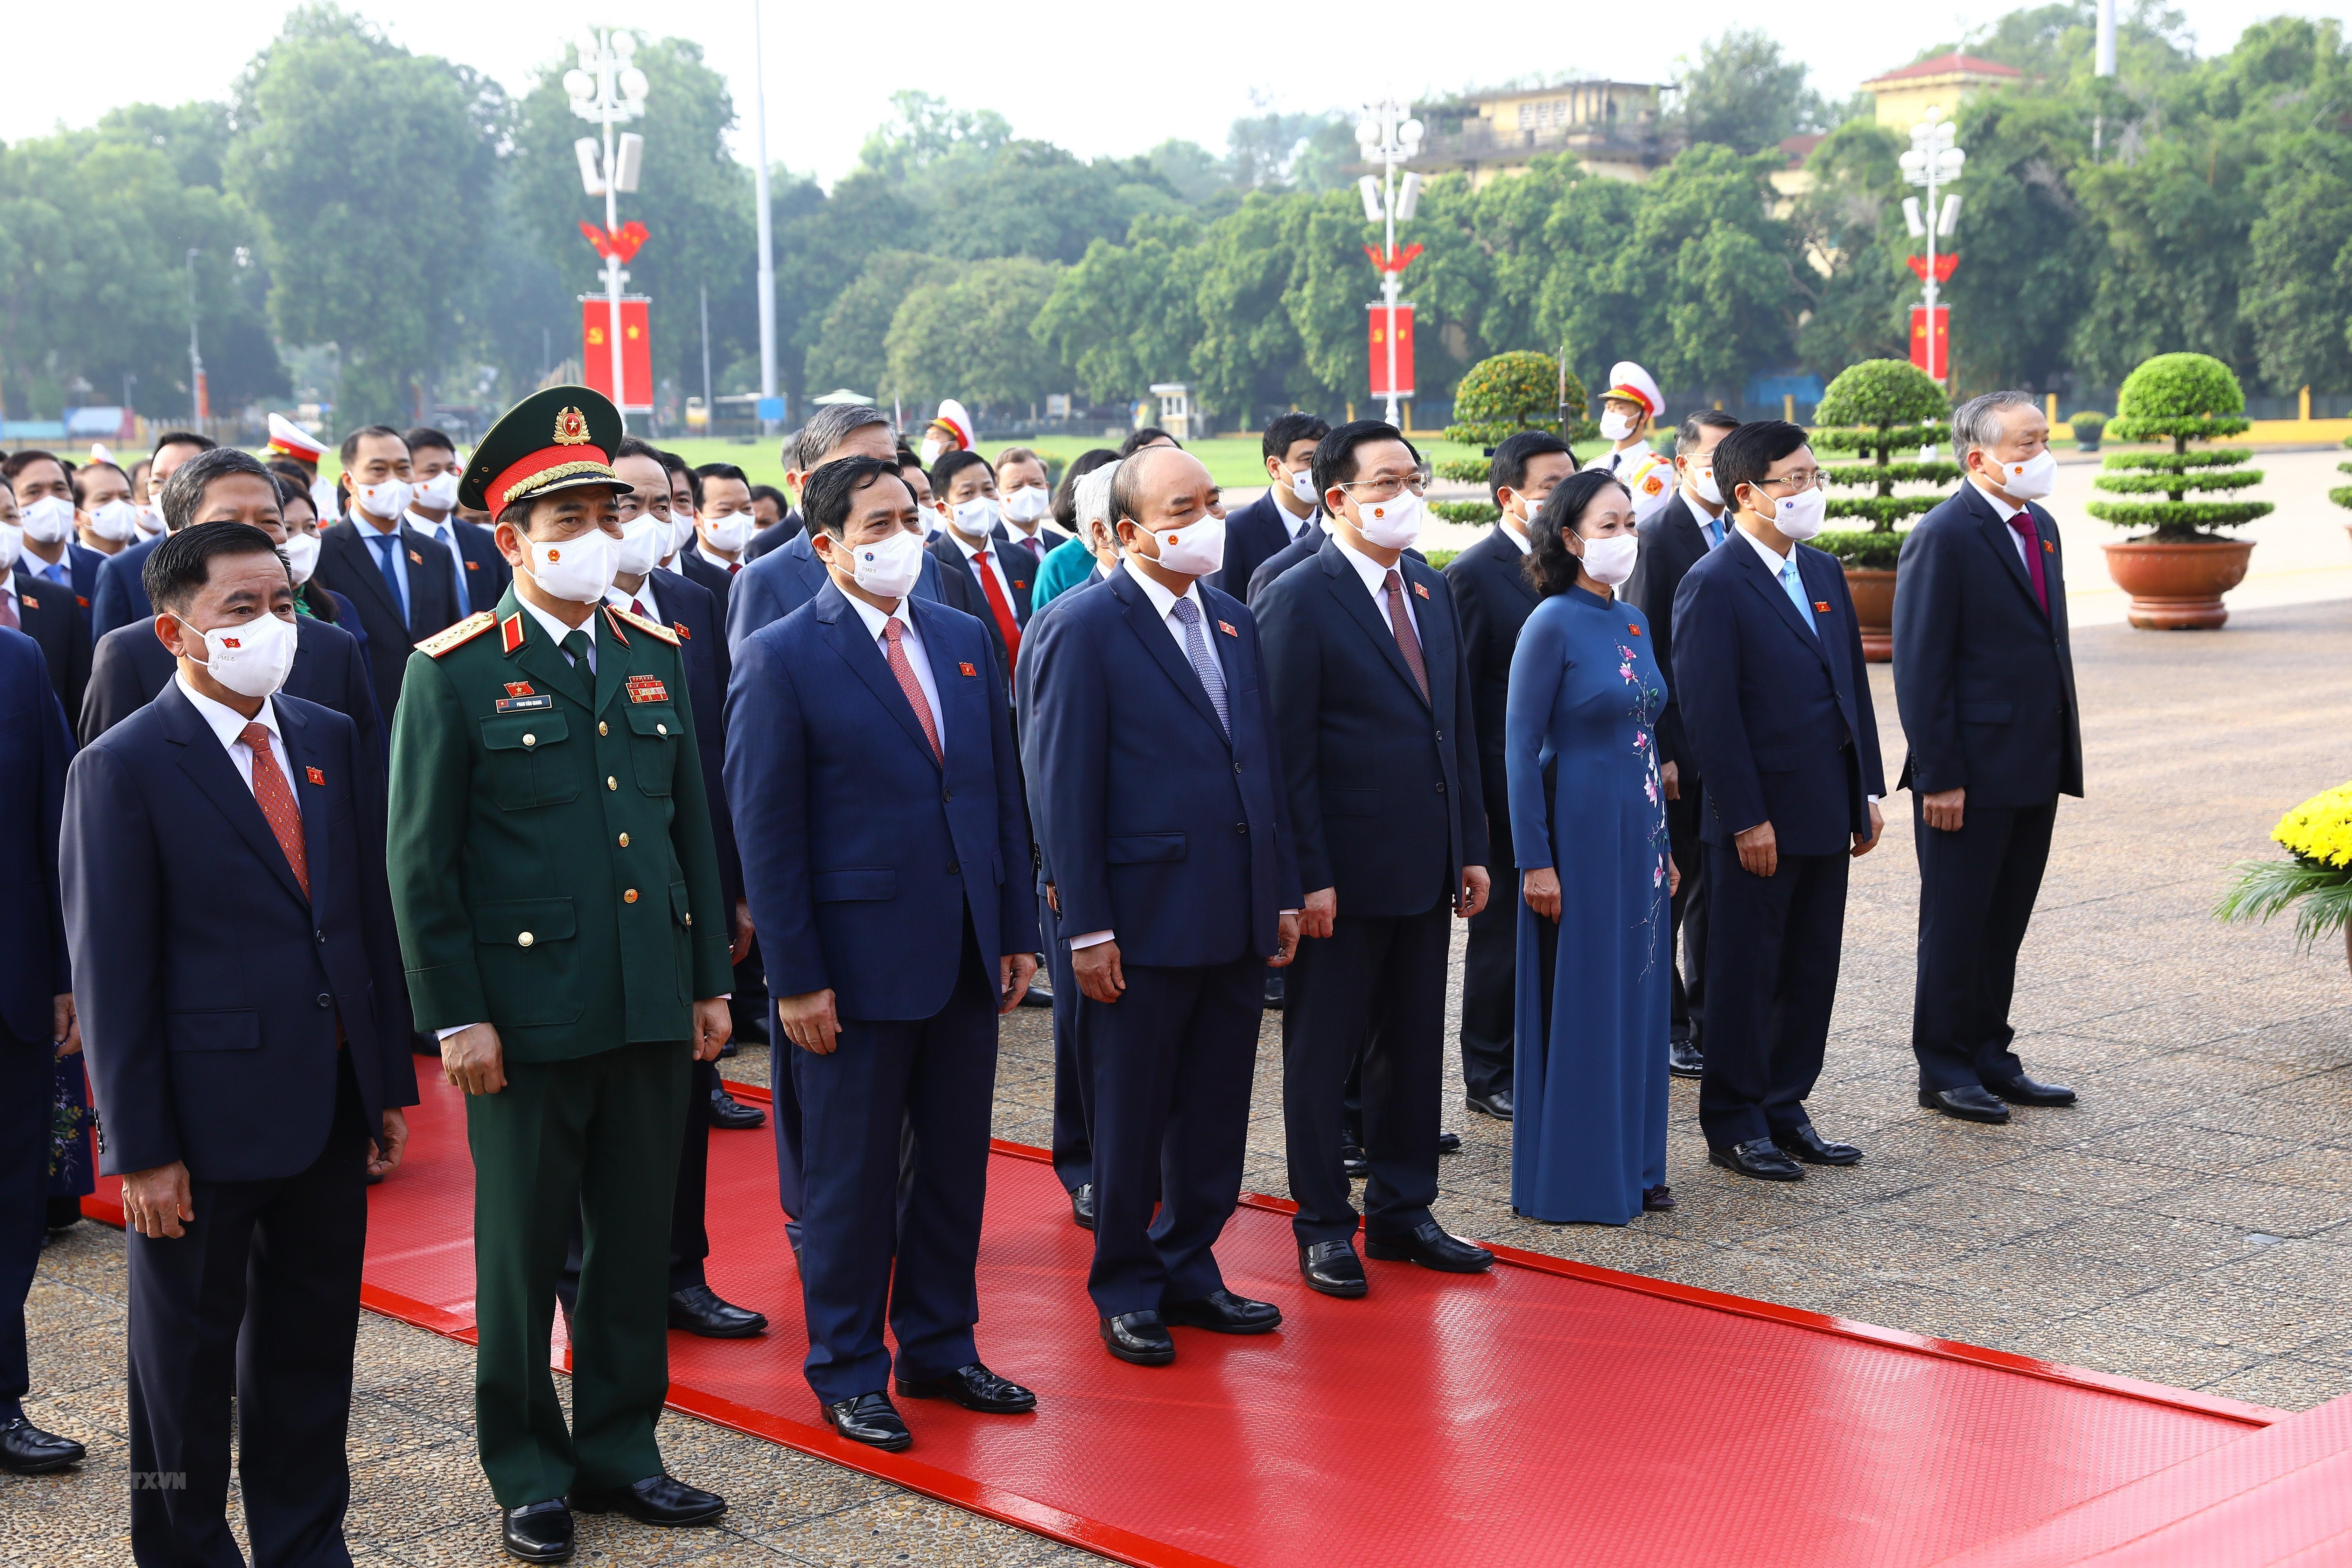 [Photo] Dai bieu Quoc hoi khoa XV vao Lang vieng Chu tich Ho Chi Minh hinh anh 3